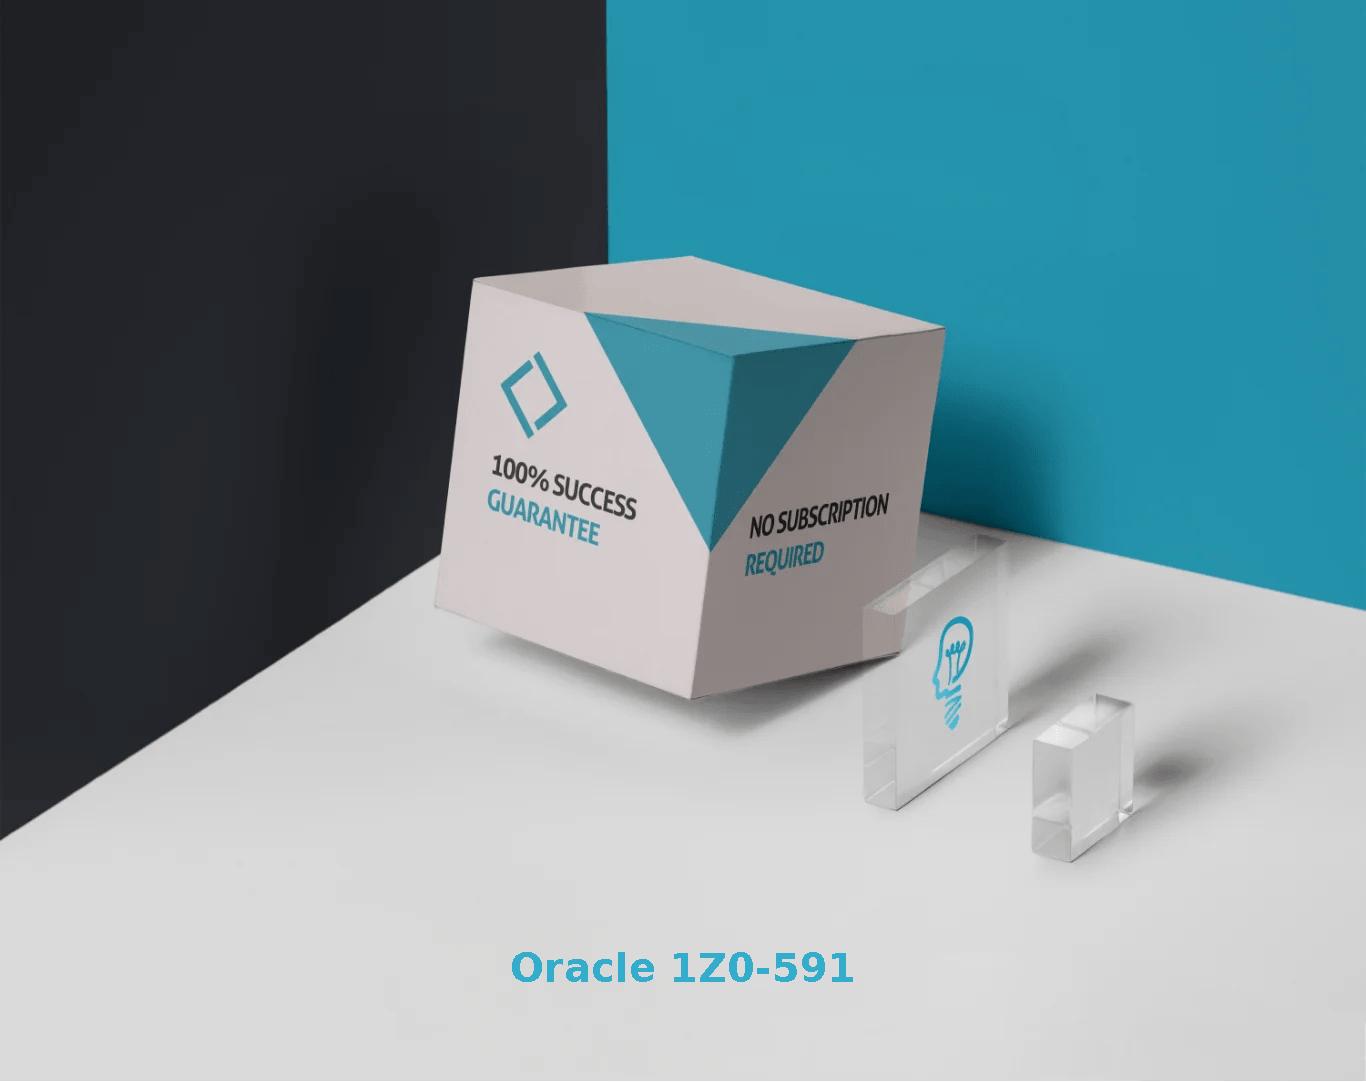 Oracle 1Z0-591 Exams